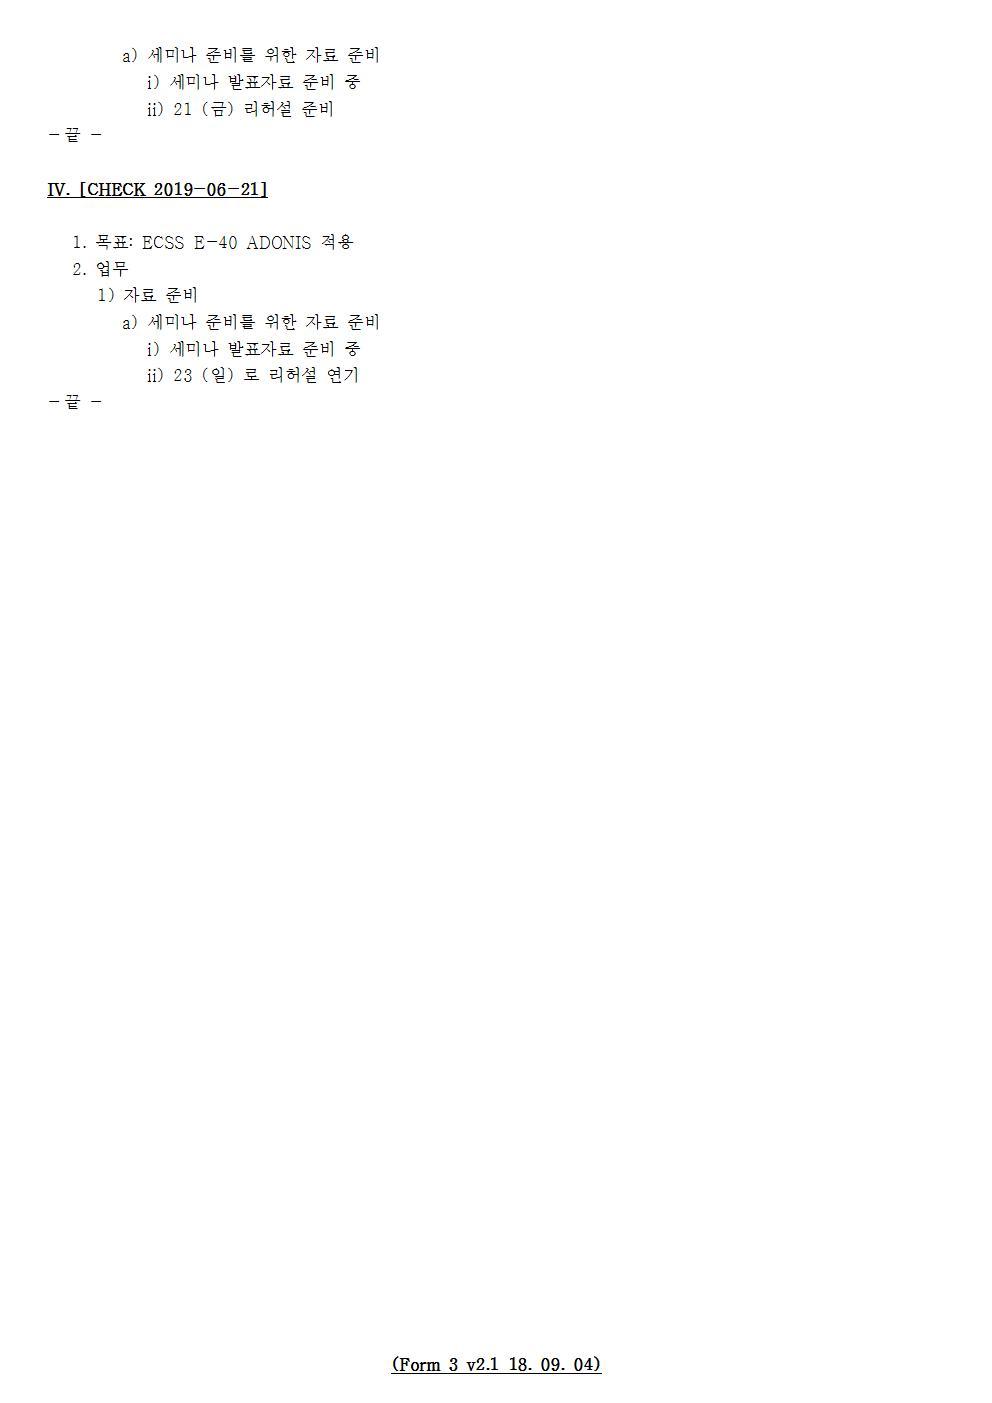 D-[19-004-RD-04]-[CMS]-[2019-06-21][YB]-[19-6-3]-[P+D+C]002.jpg